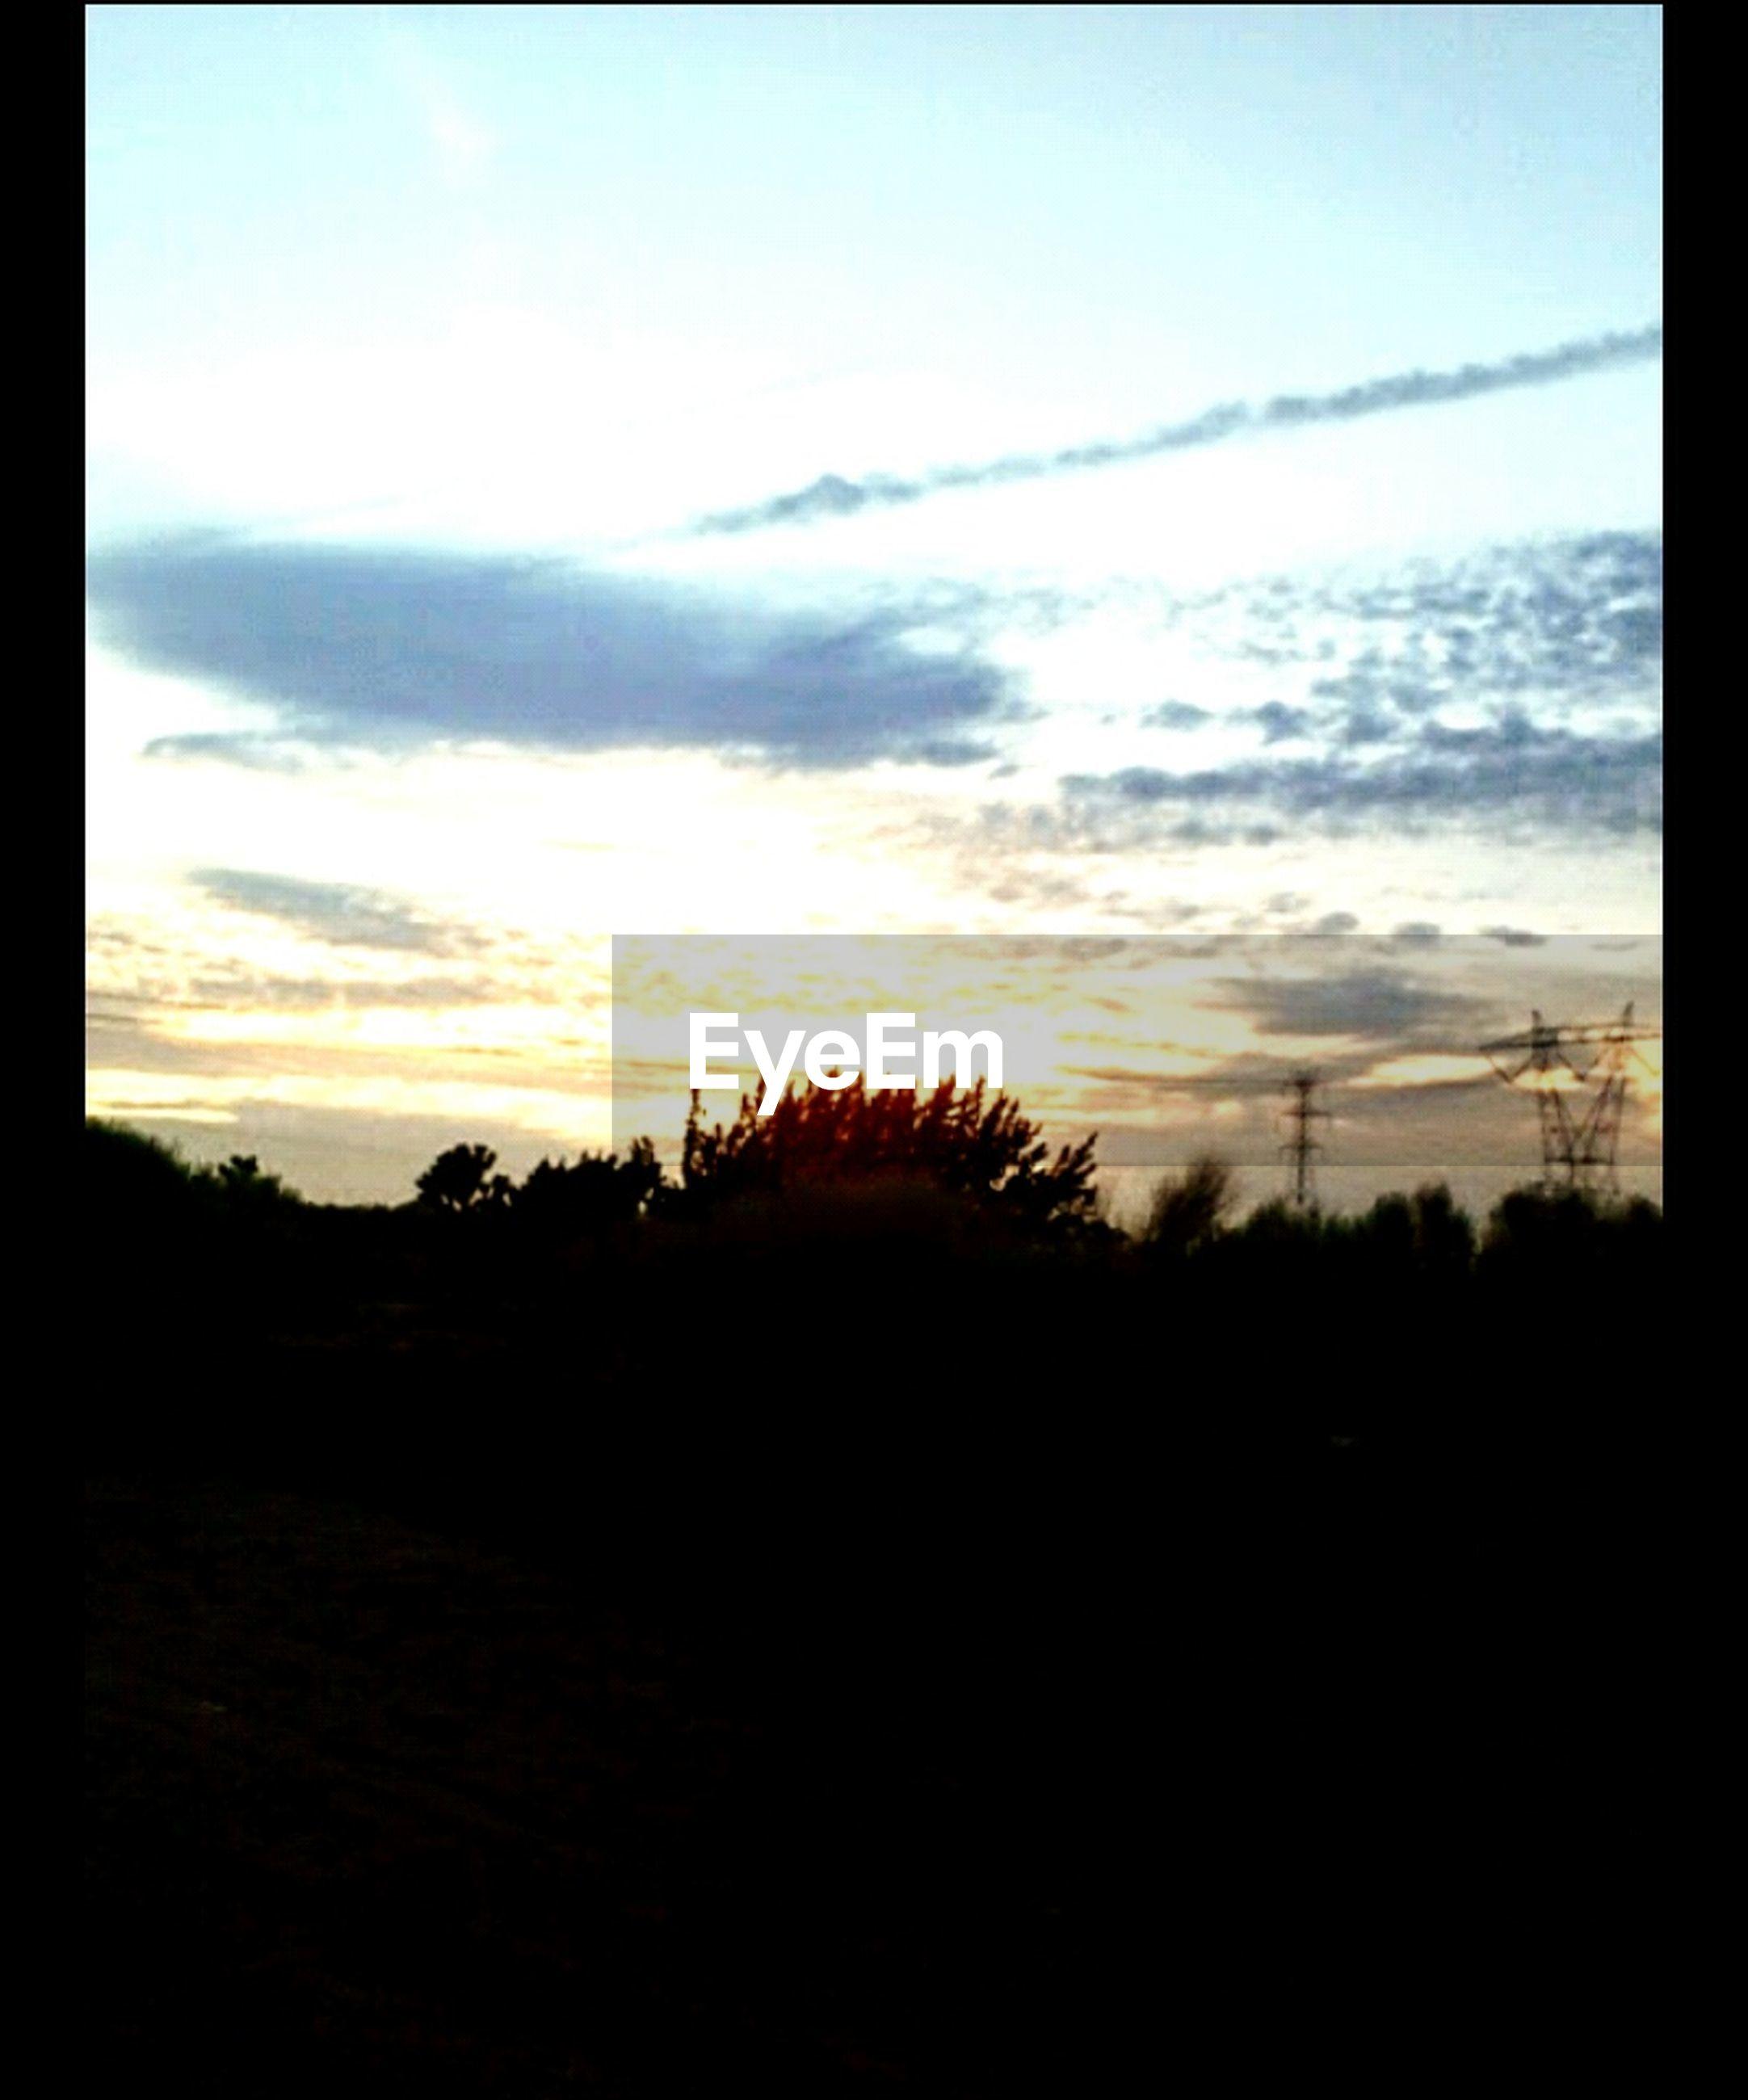 sunset, silhouette, tranquil scene, tranquility, sky, scenics, landscape, beauty in nature, tree, nature, field, cloud - sky, idyllic, dark, cloud, orange color, non-urban scene, dusk, non urban scene, outdoors